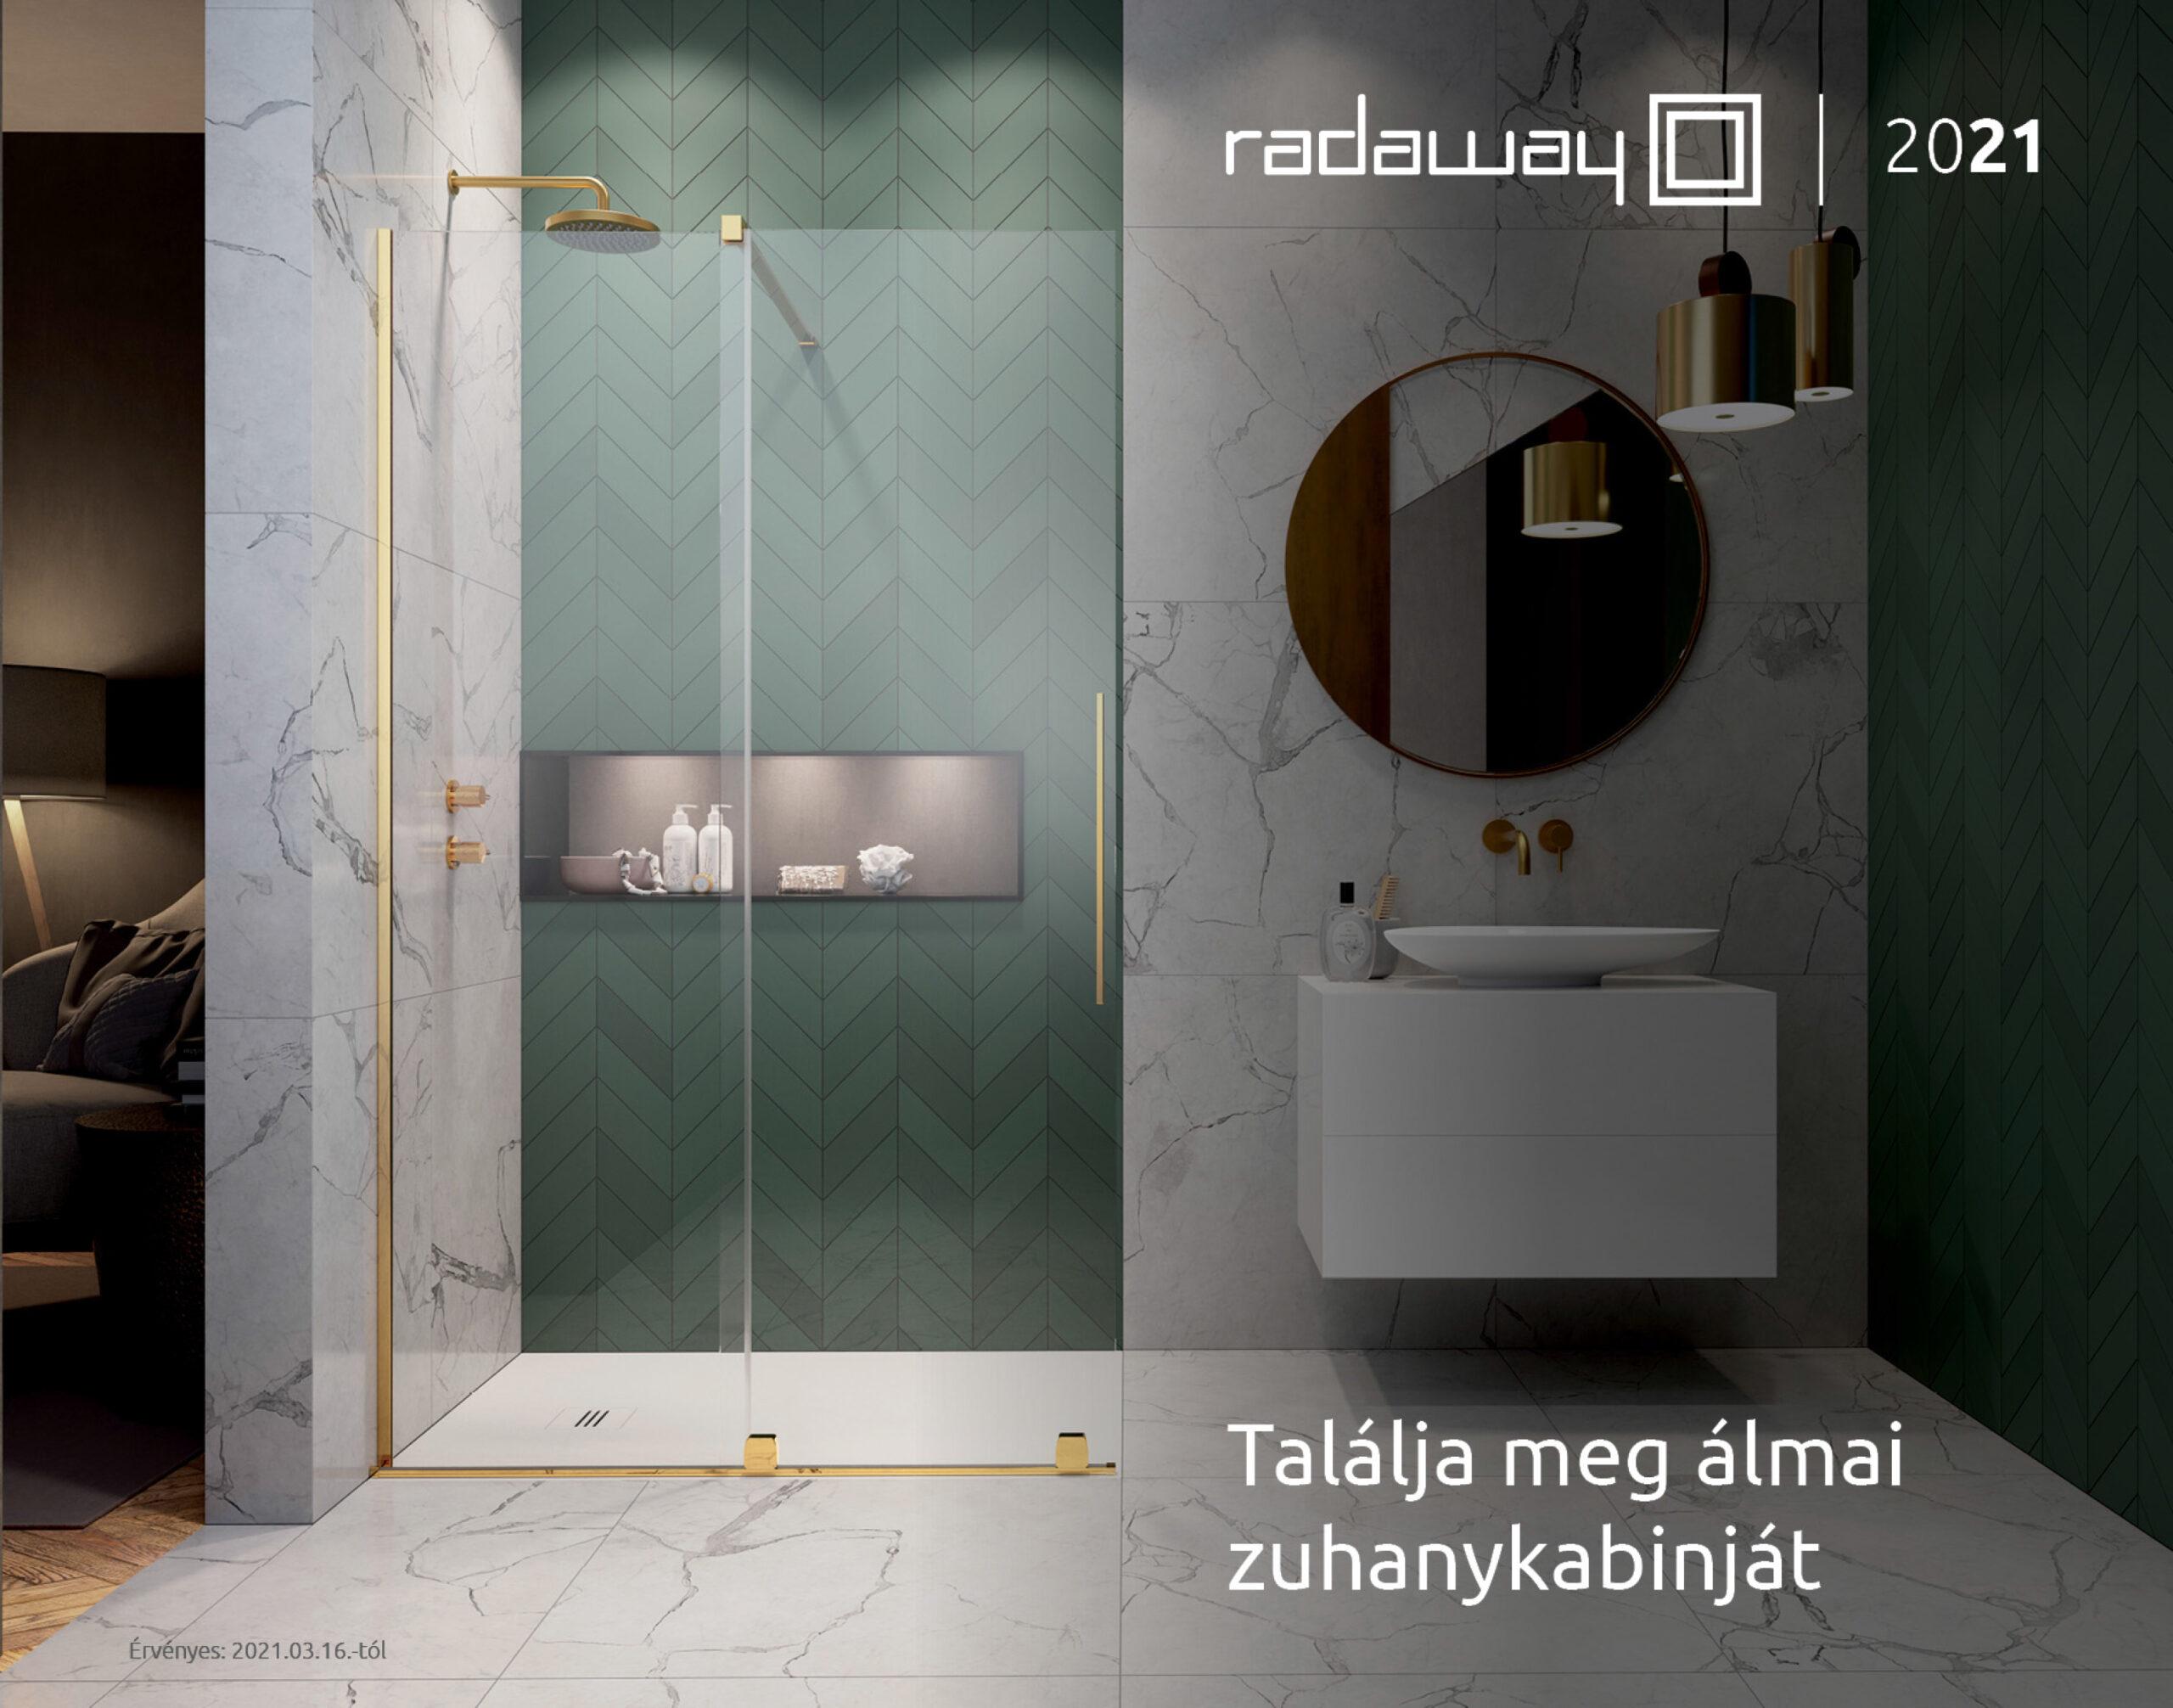 Radaway 2021